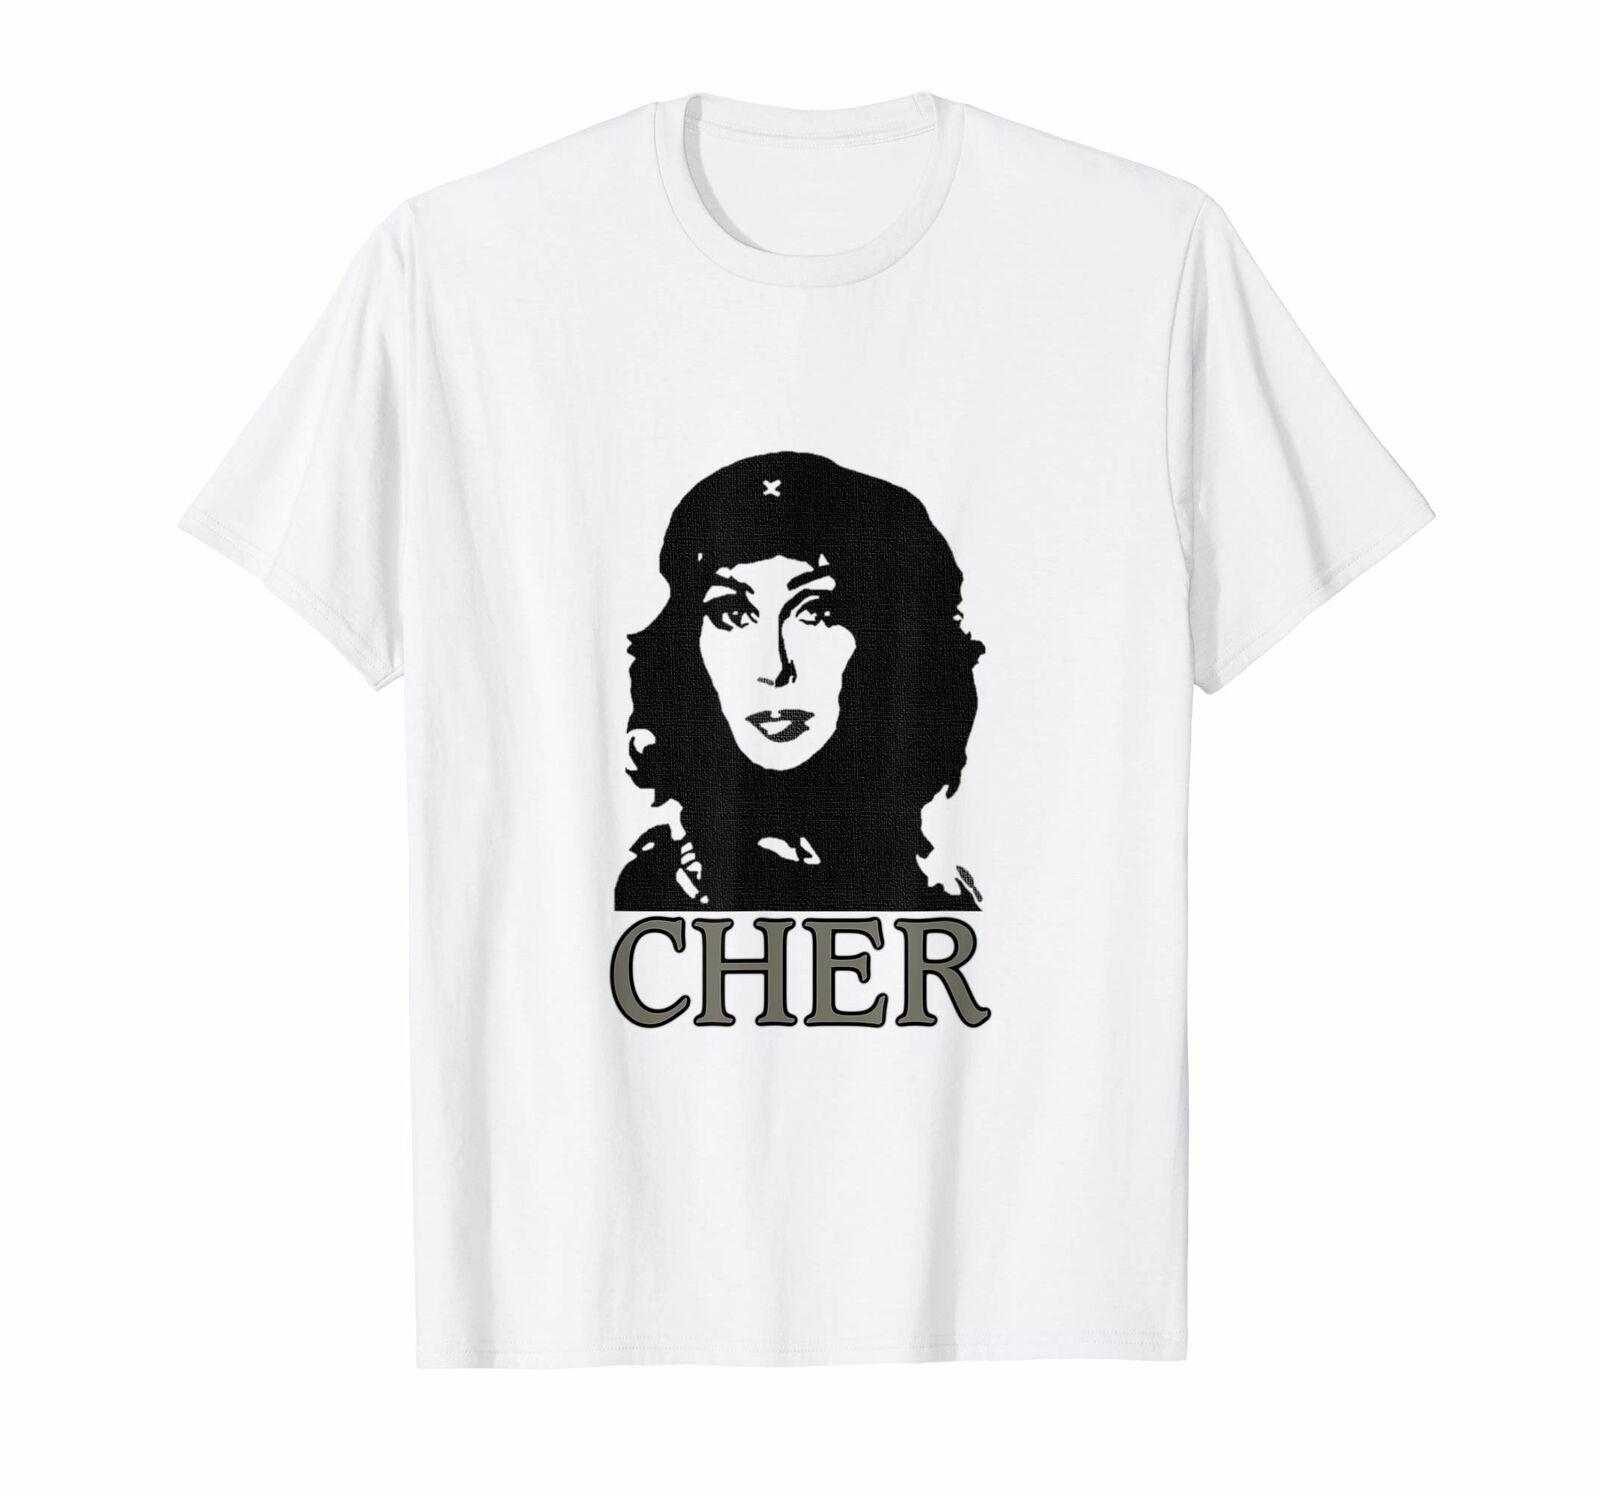 2019 moda cher deusa do pop acreditar che guevara feminista branco camiseta unissex